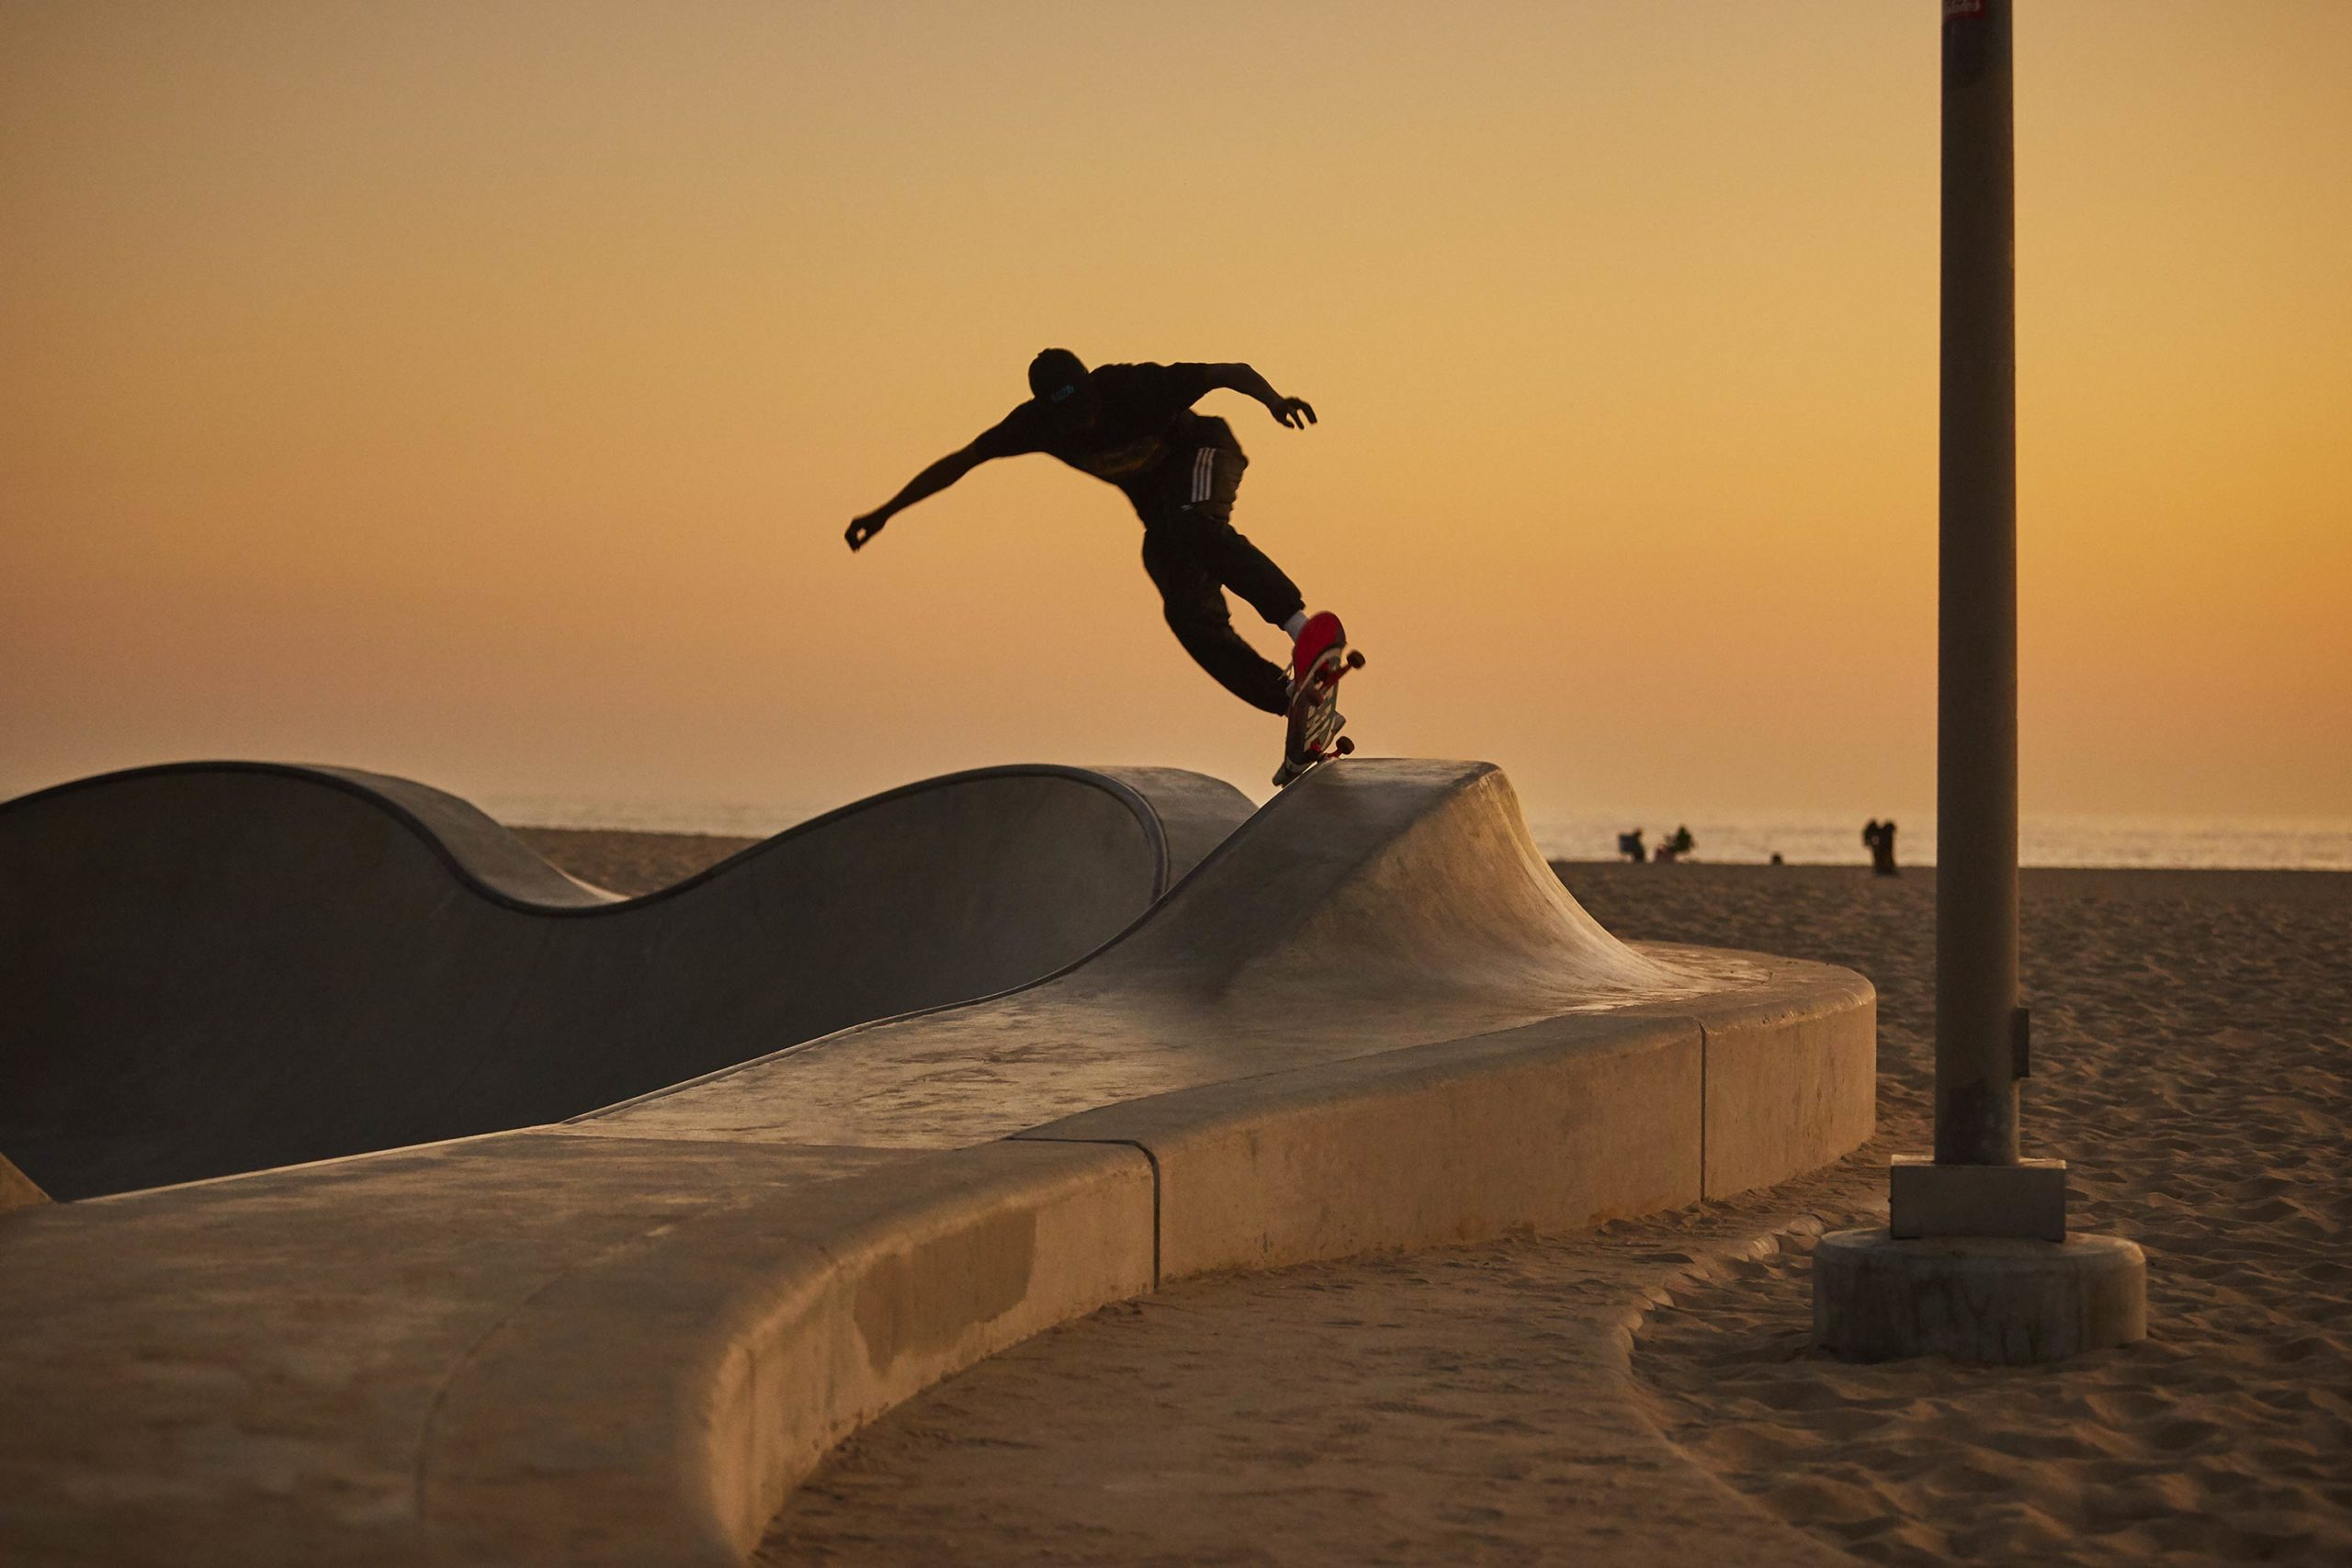 Under Last Light - Skate Park, Venice Beach Collection - Fine Art Photography by Toby Dixon